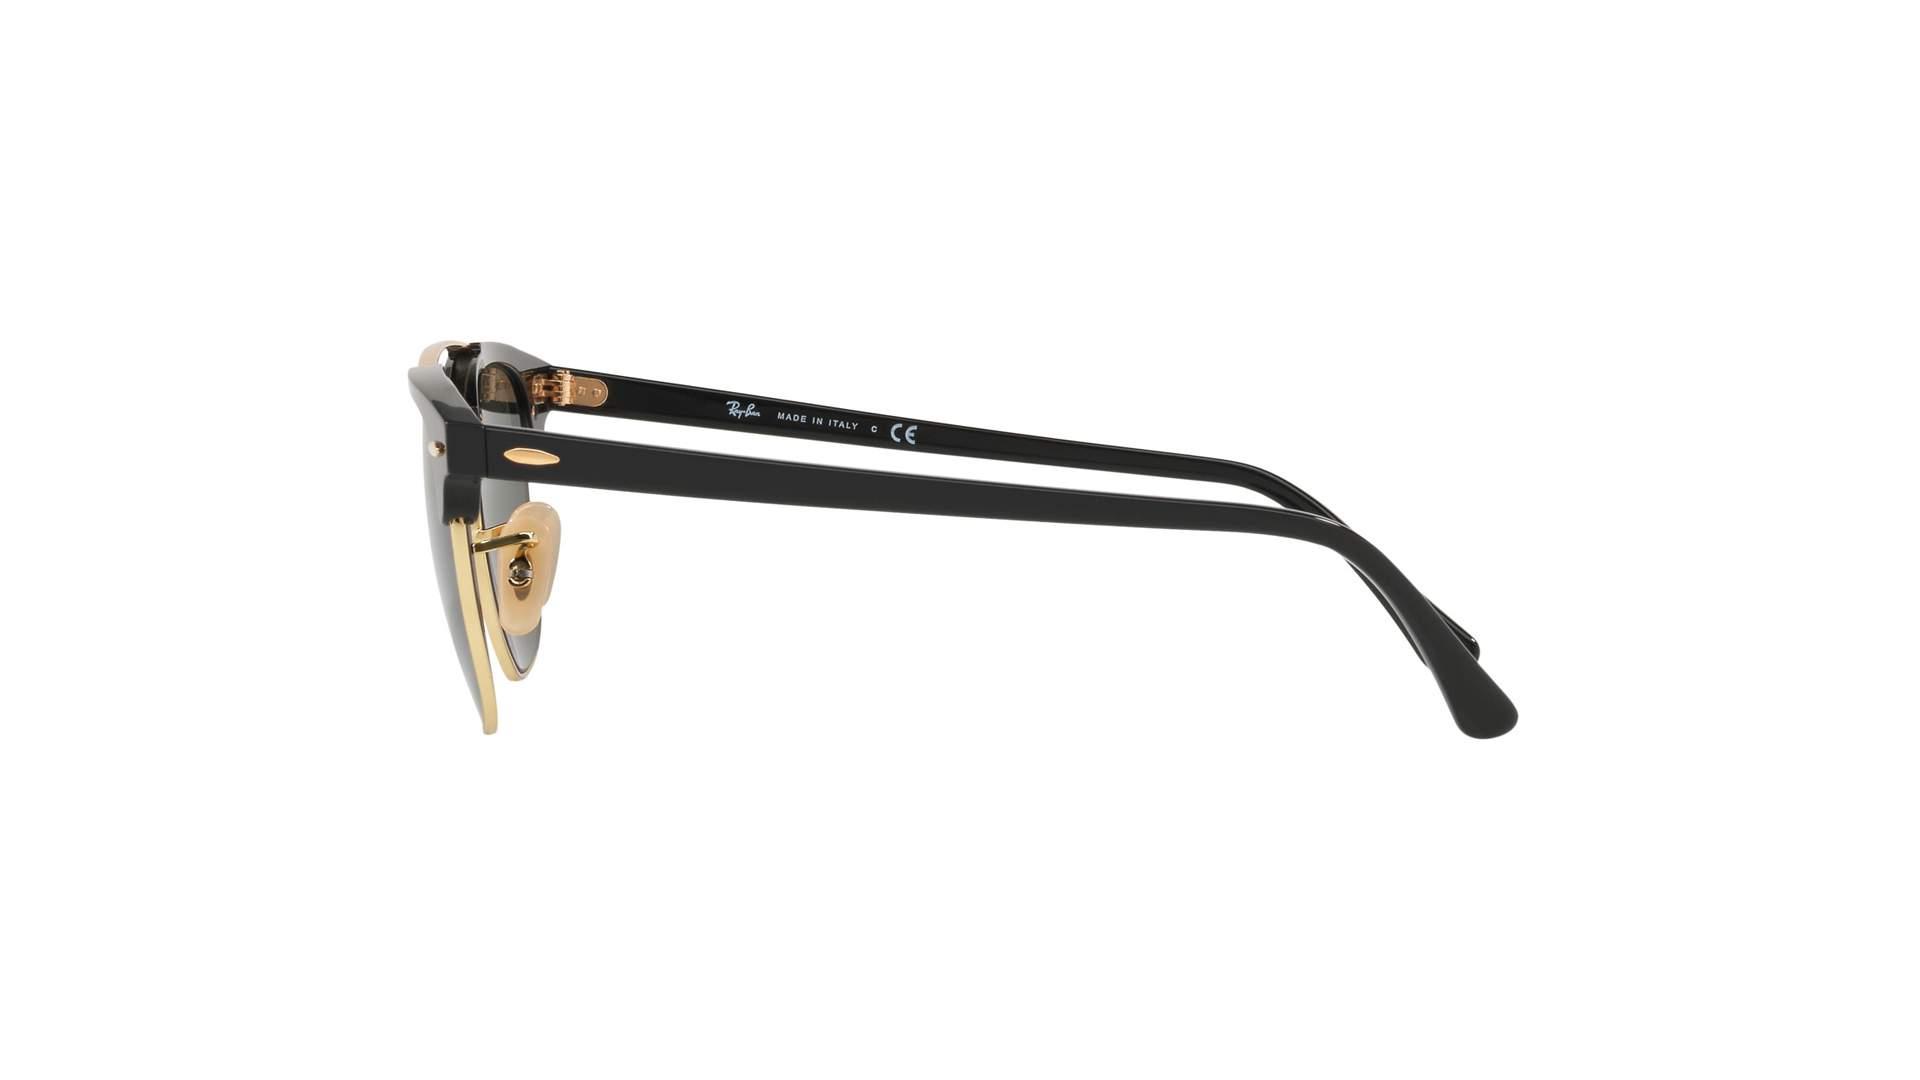 8df0d6a854a53 Sunglasses Ray-Ban Clubmaster Double Bridge Black G-15 RB3816 901 51-21  Medium